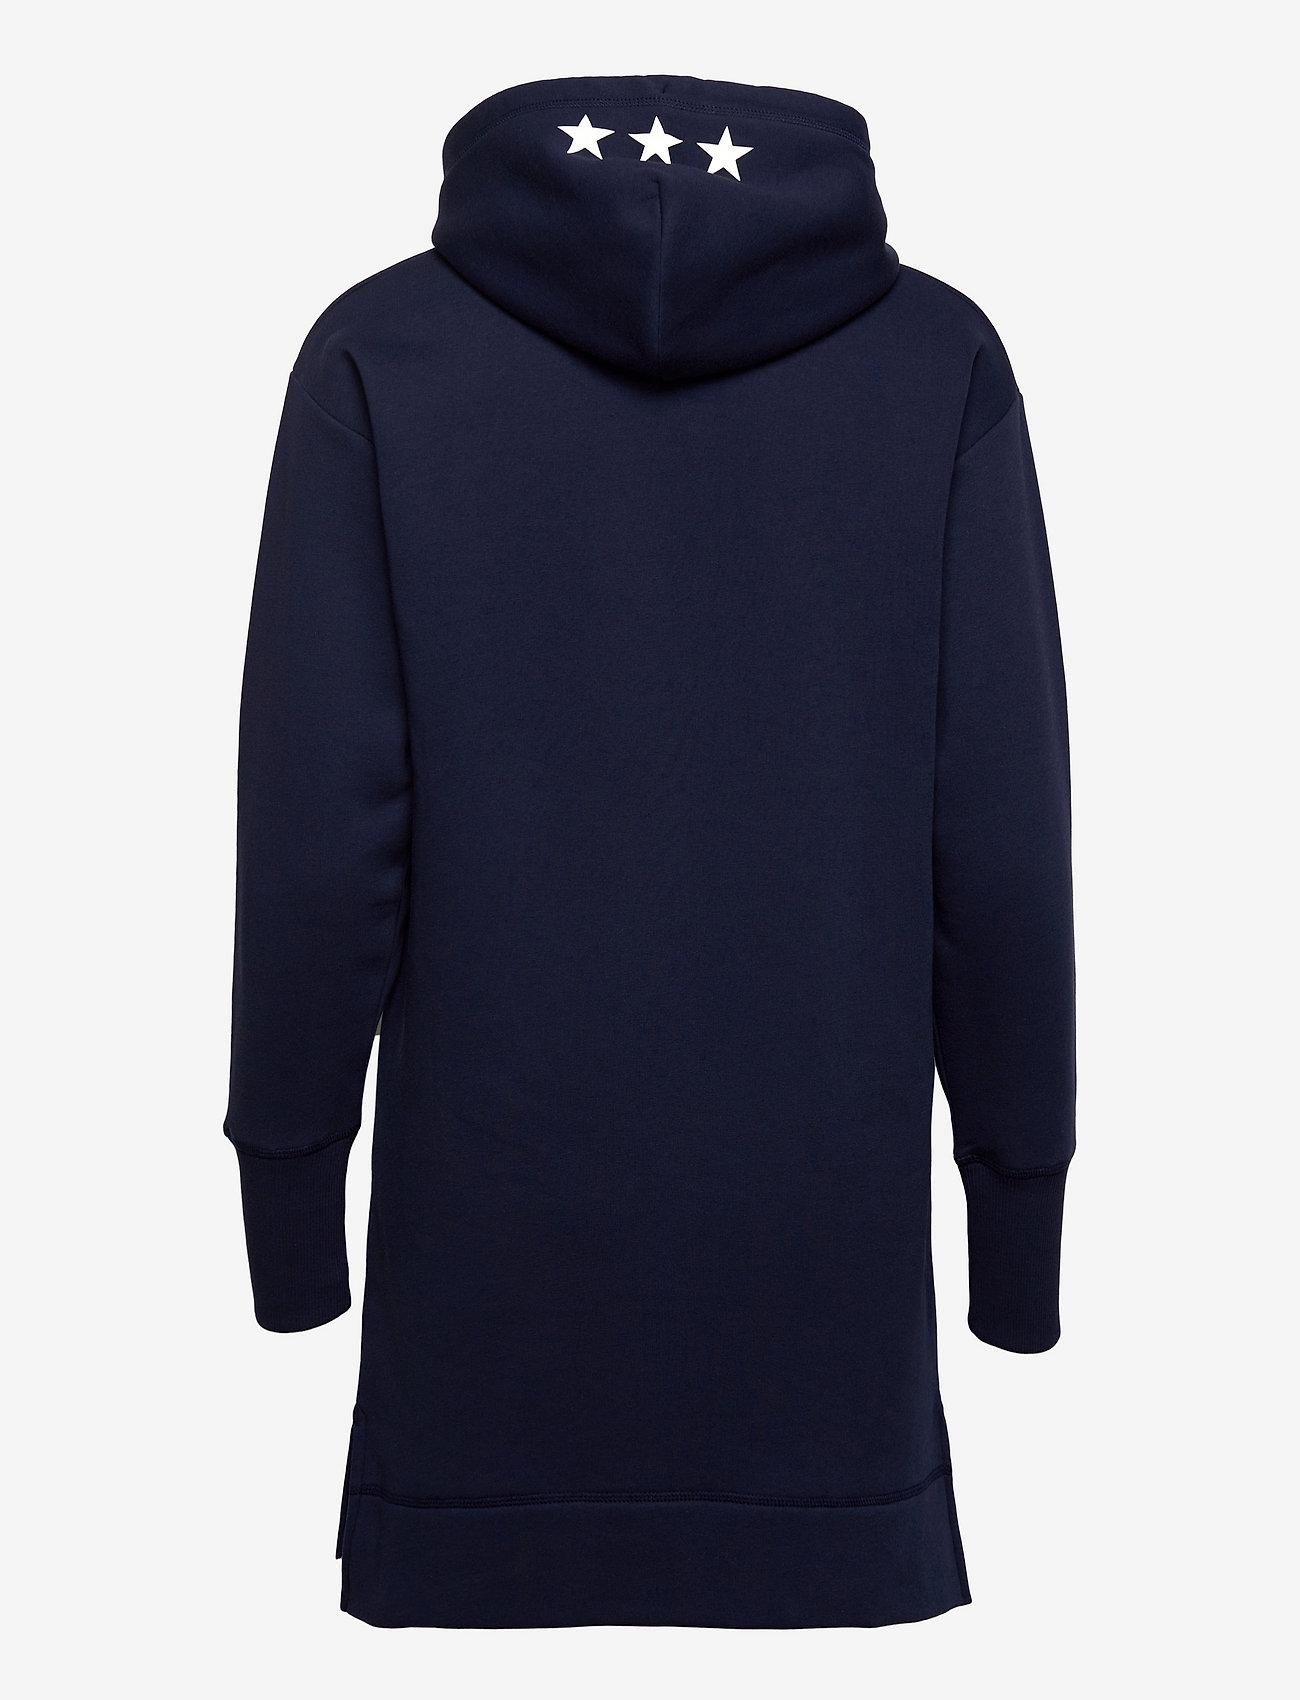 GANT - D2. GANT RETRO SHIELD HOODIE DRESS - t-shirt dresses - classic blue - 1